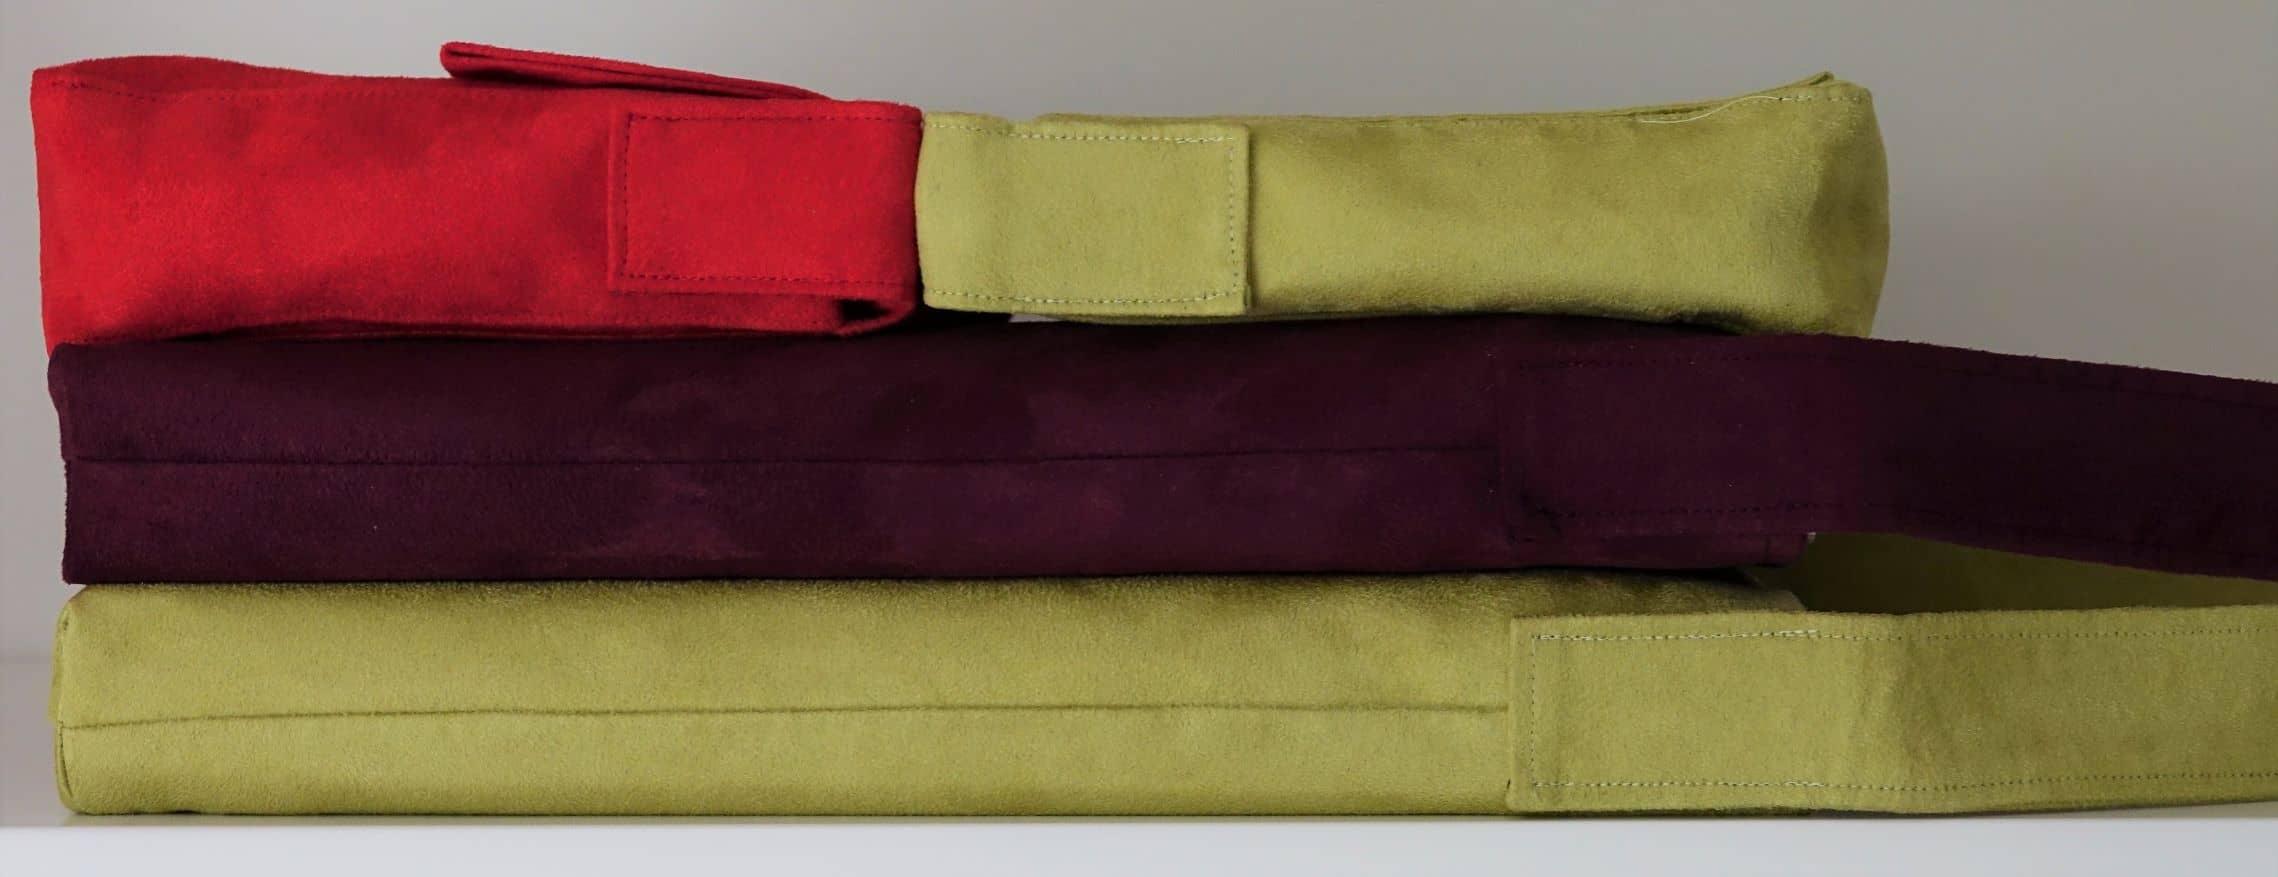 hobobag sac baguette suédine anis et rouge aloée